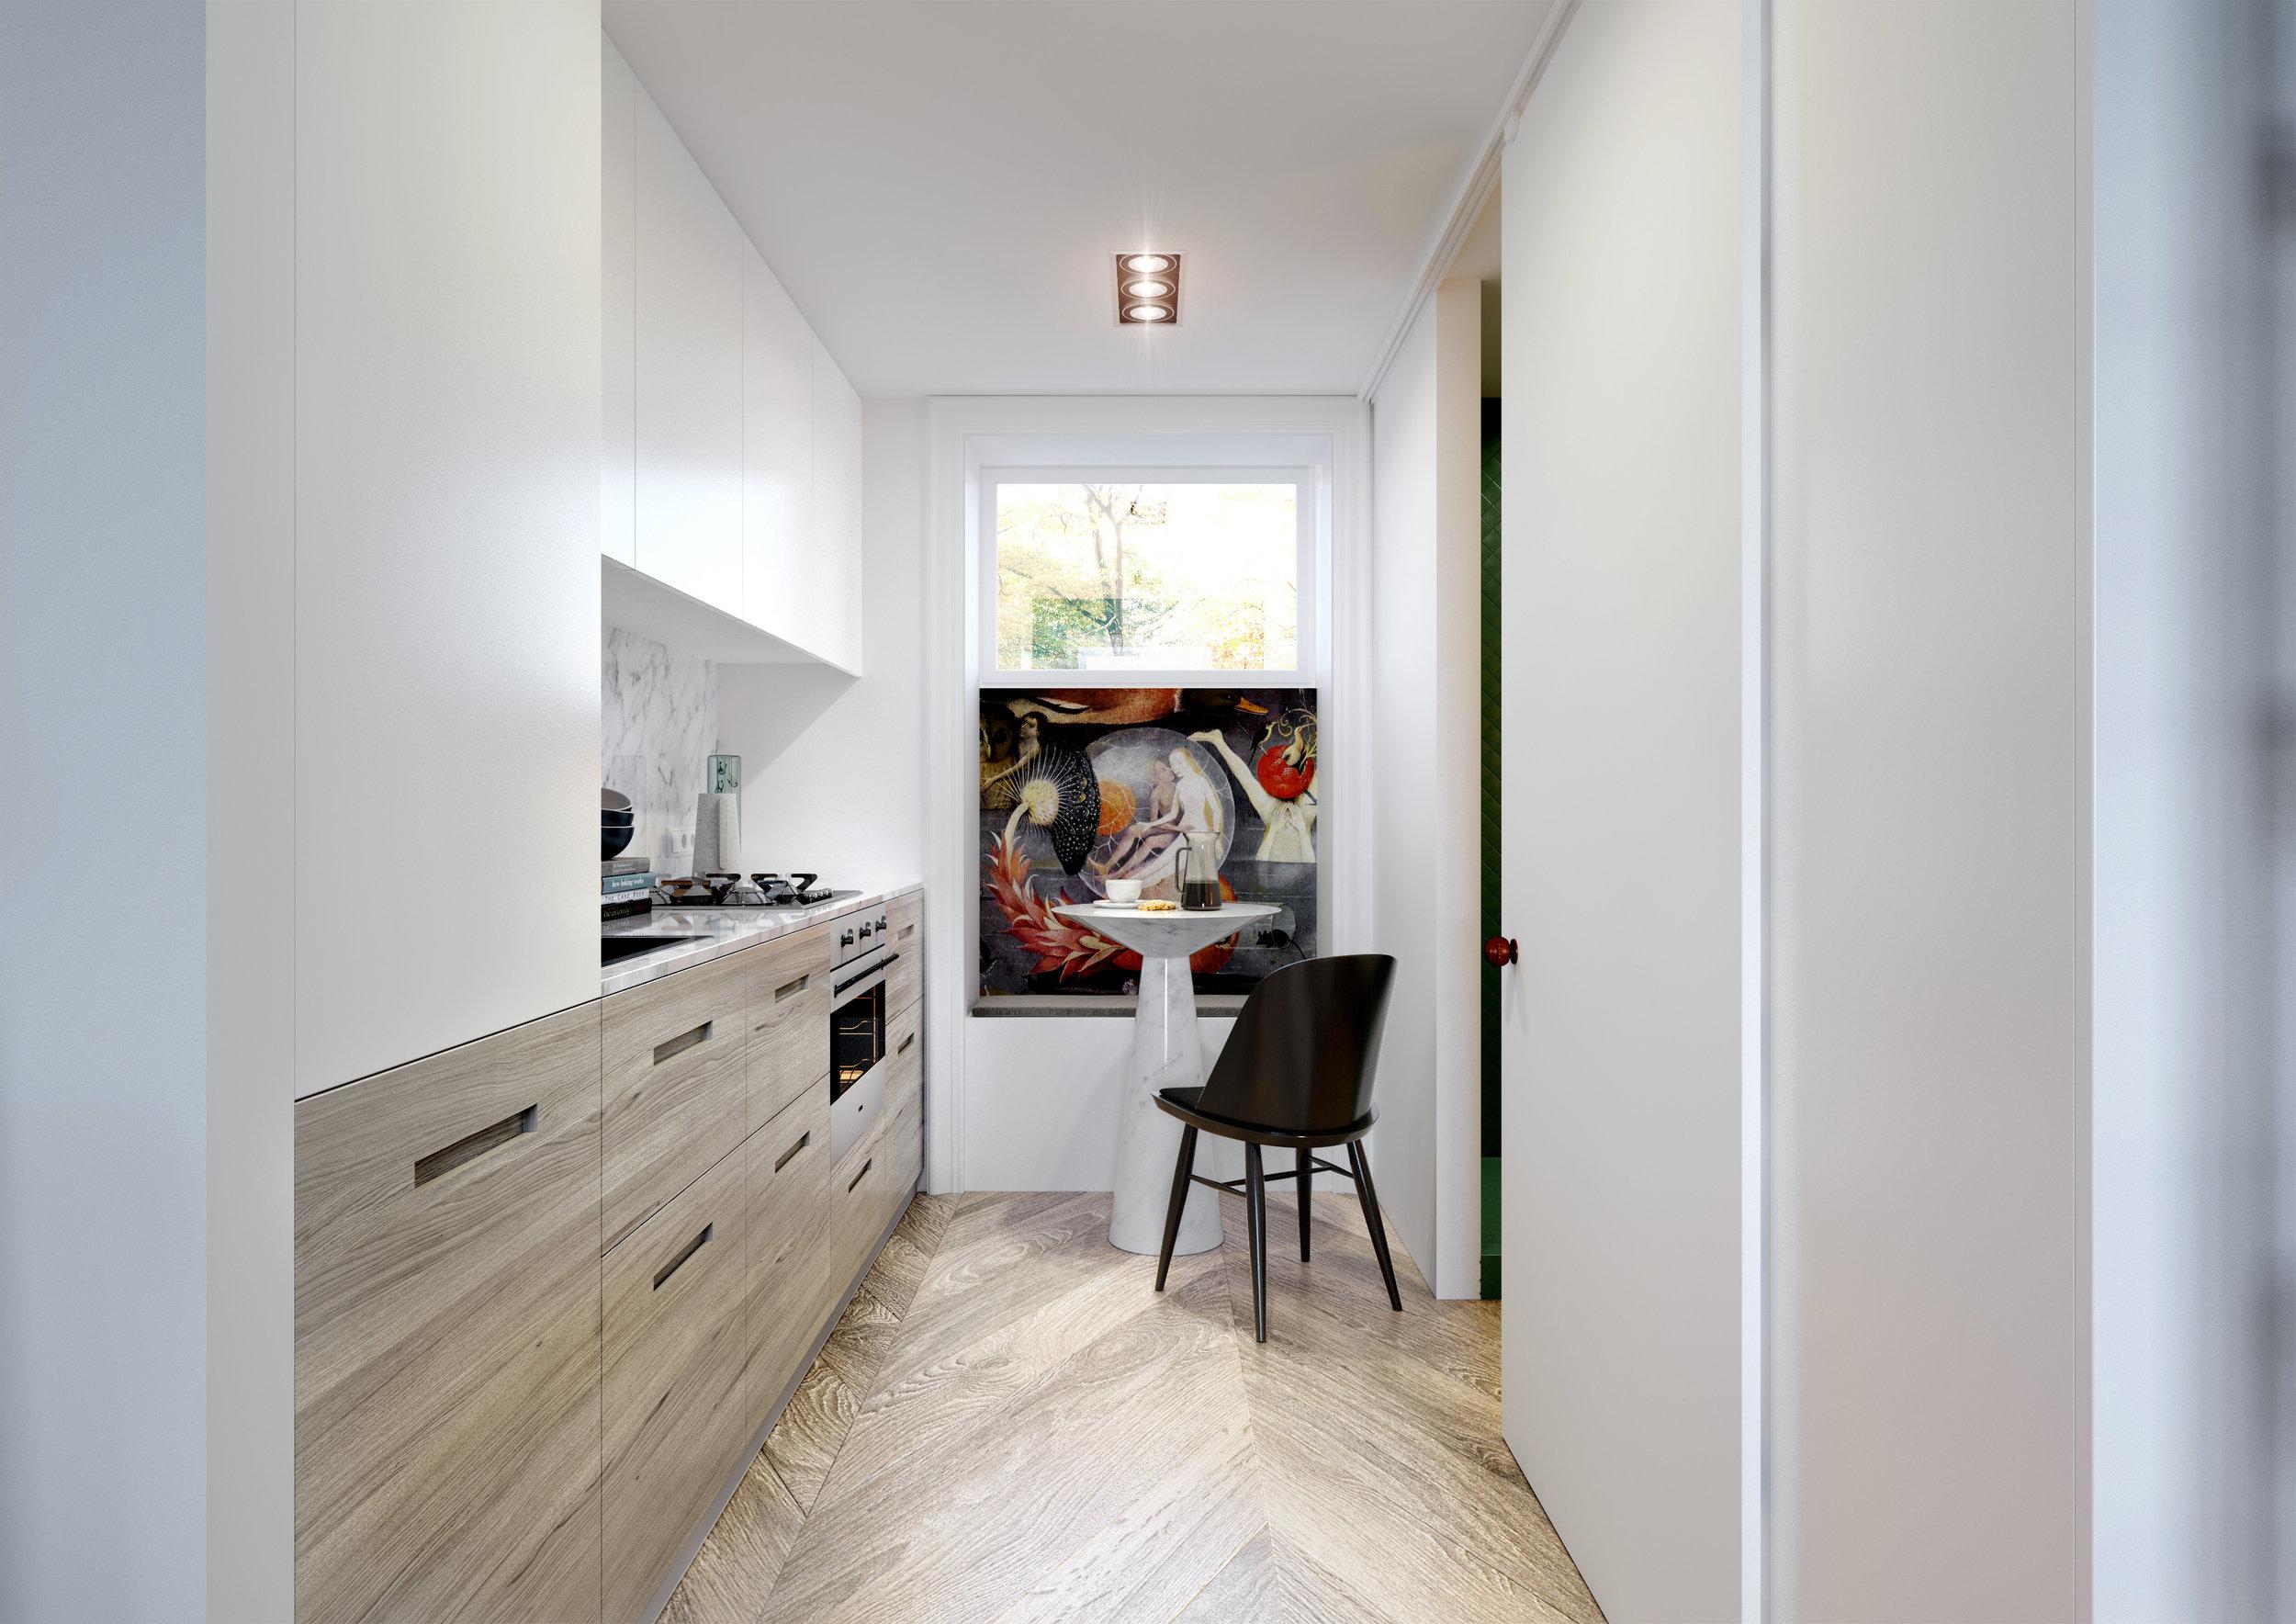 Kawalerka W Lublinie Oh My Bosch Home And Wood